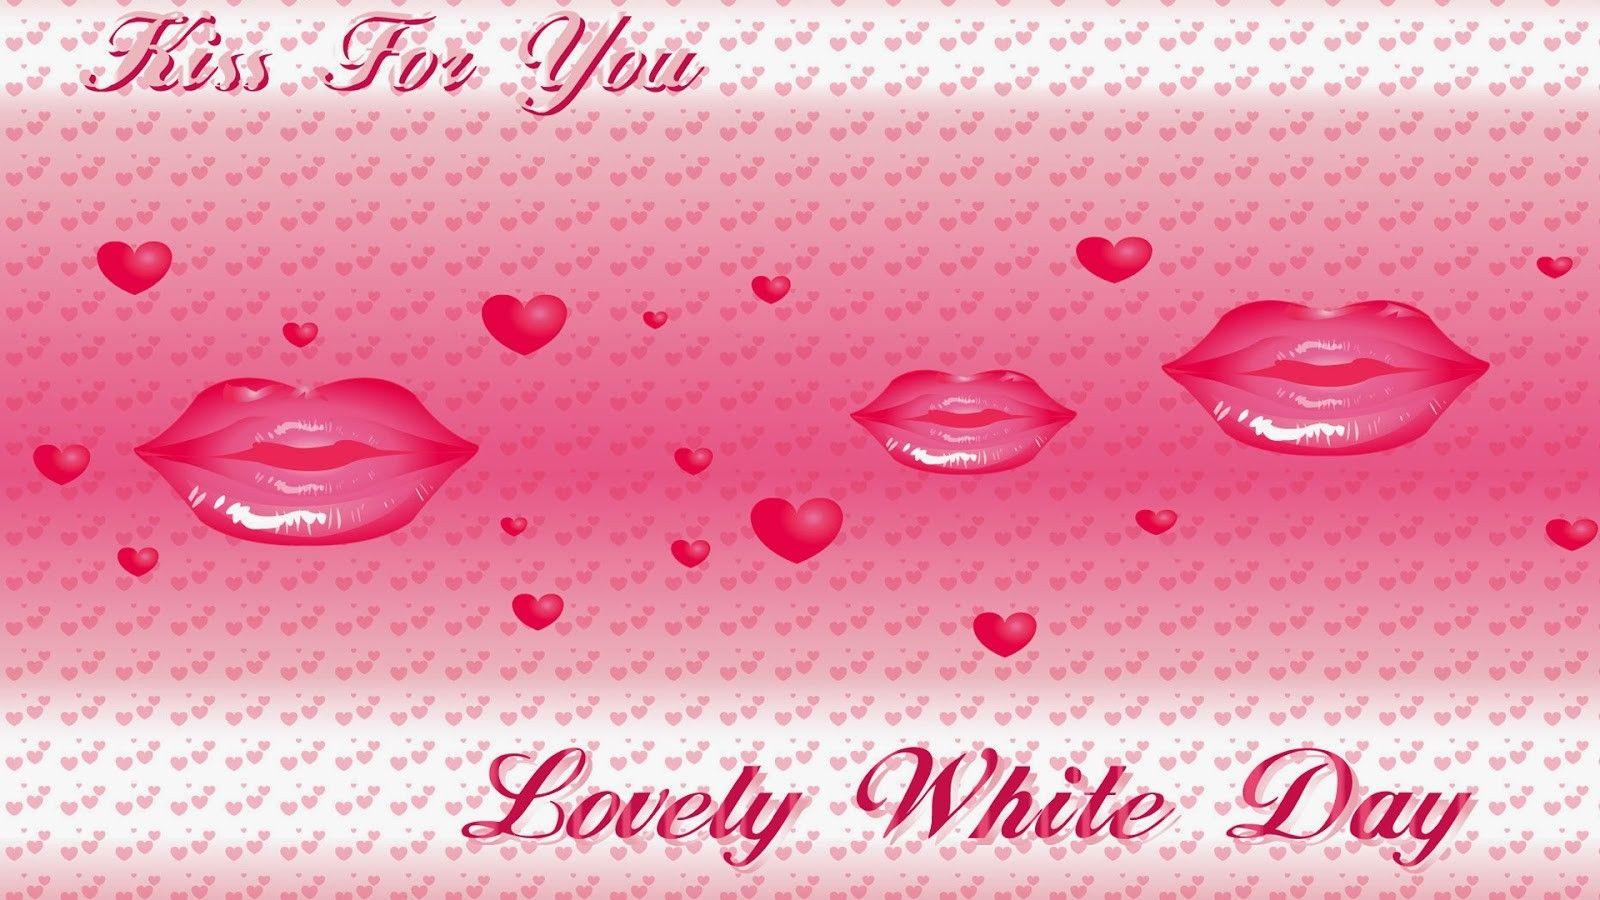 Lips Kiss Wallpaper Mobile - impremedia.net